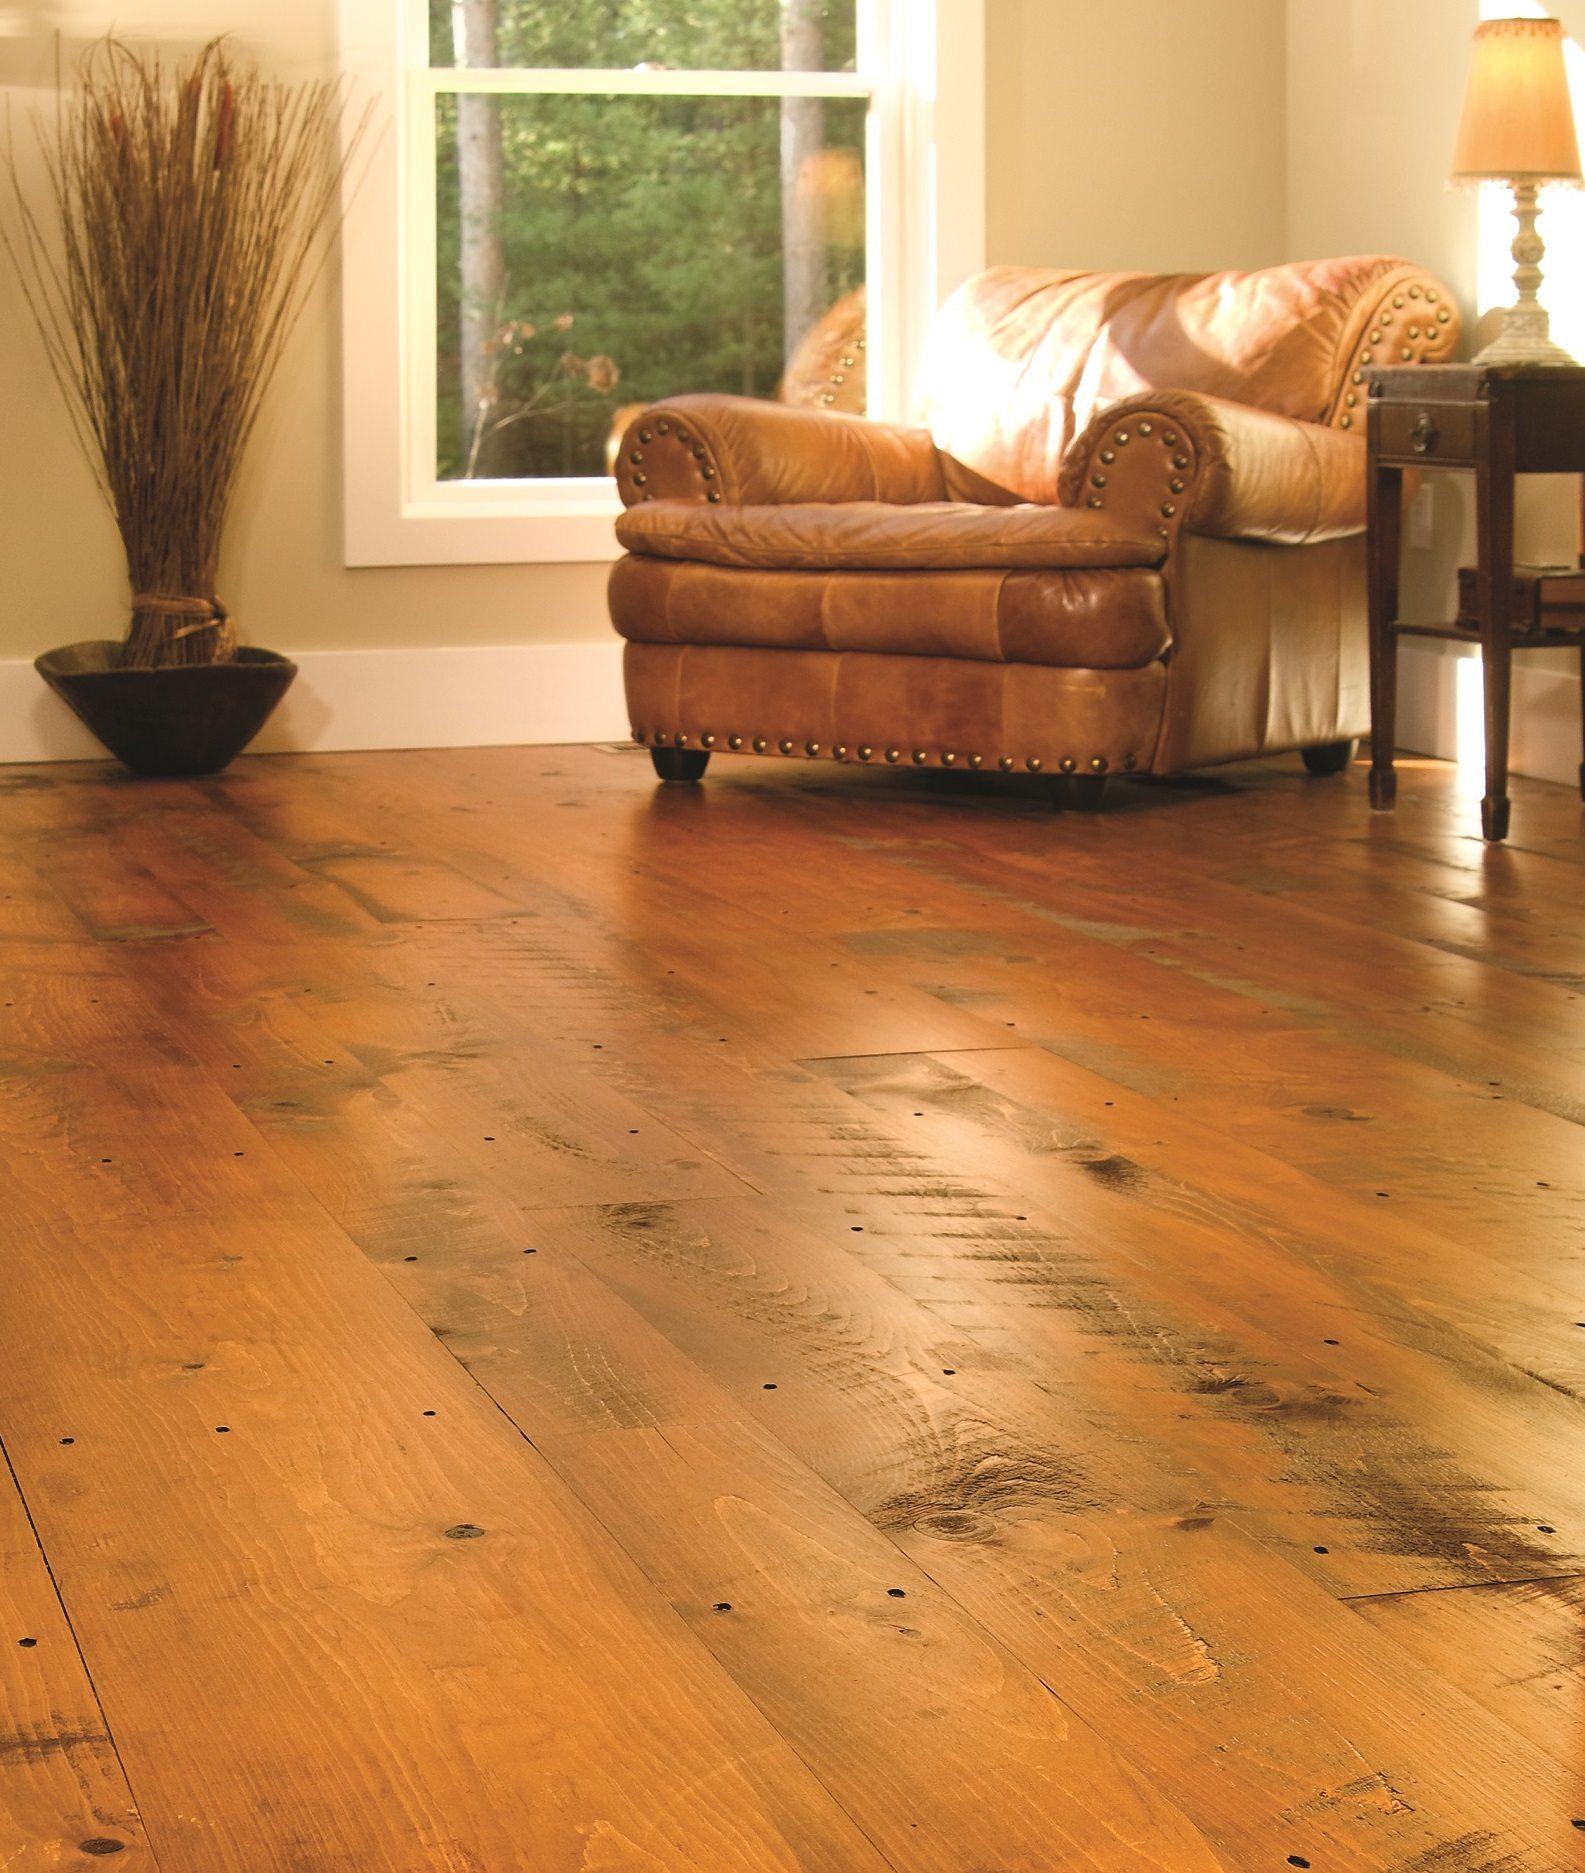 Distressed Wood Flooring U0026 Pine Flooring From Carlisle Wide Plank Floors